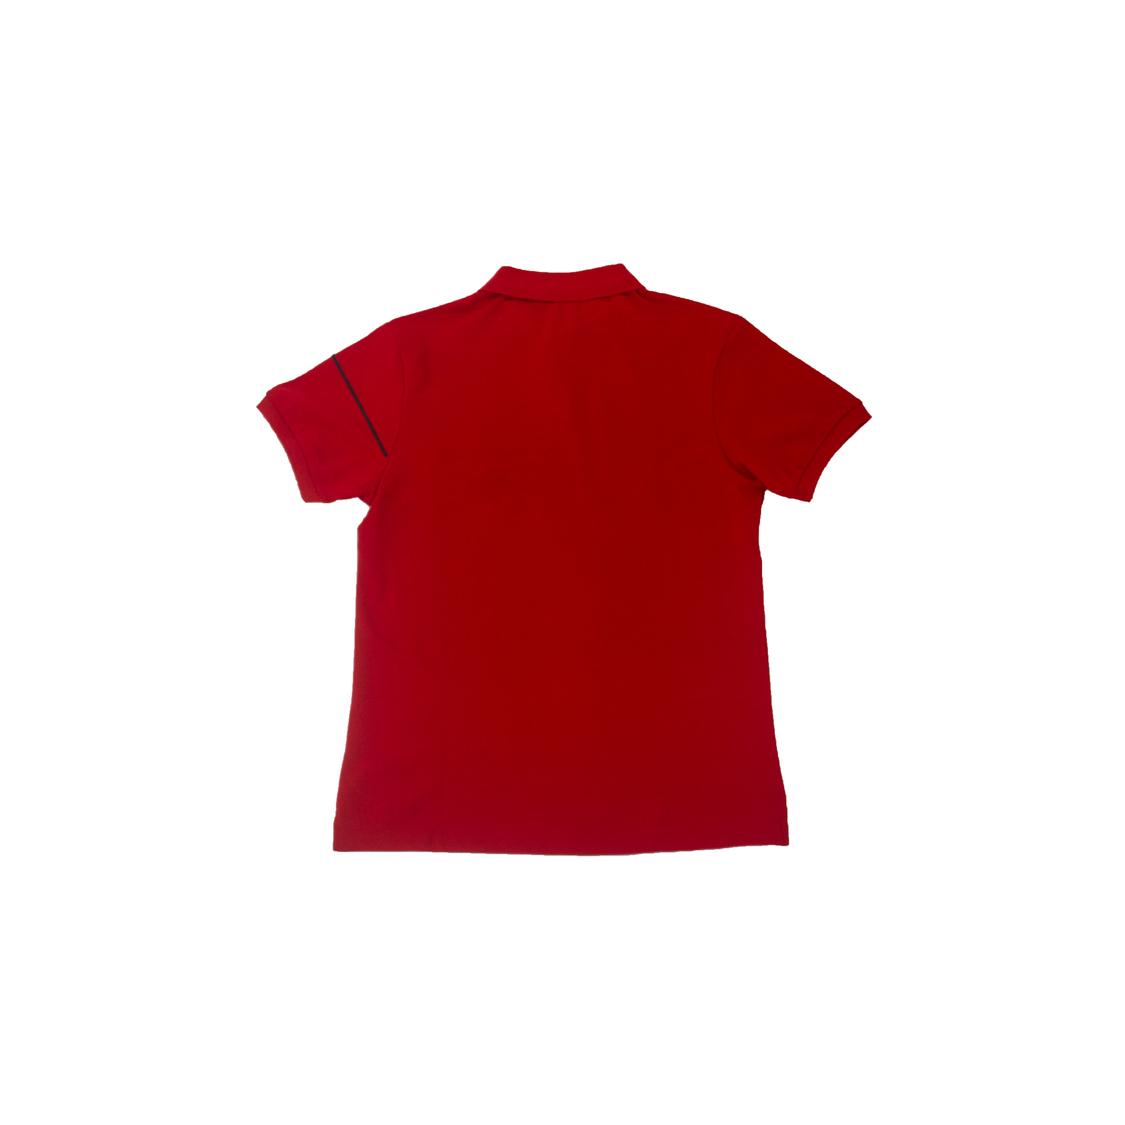 Áo Polo Givenchy Paris thêu ngực đỏ